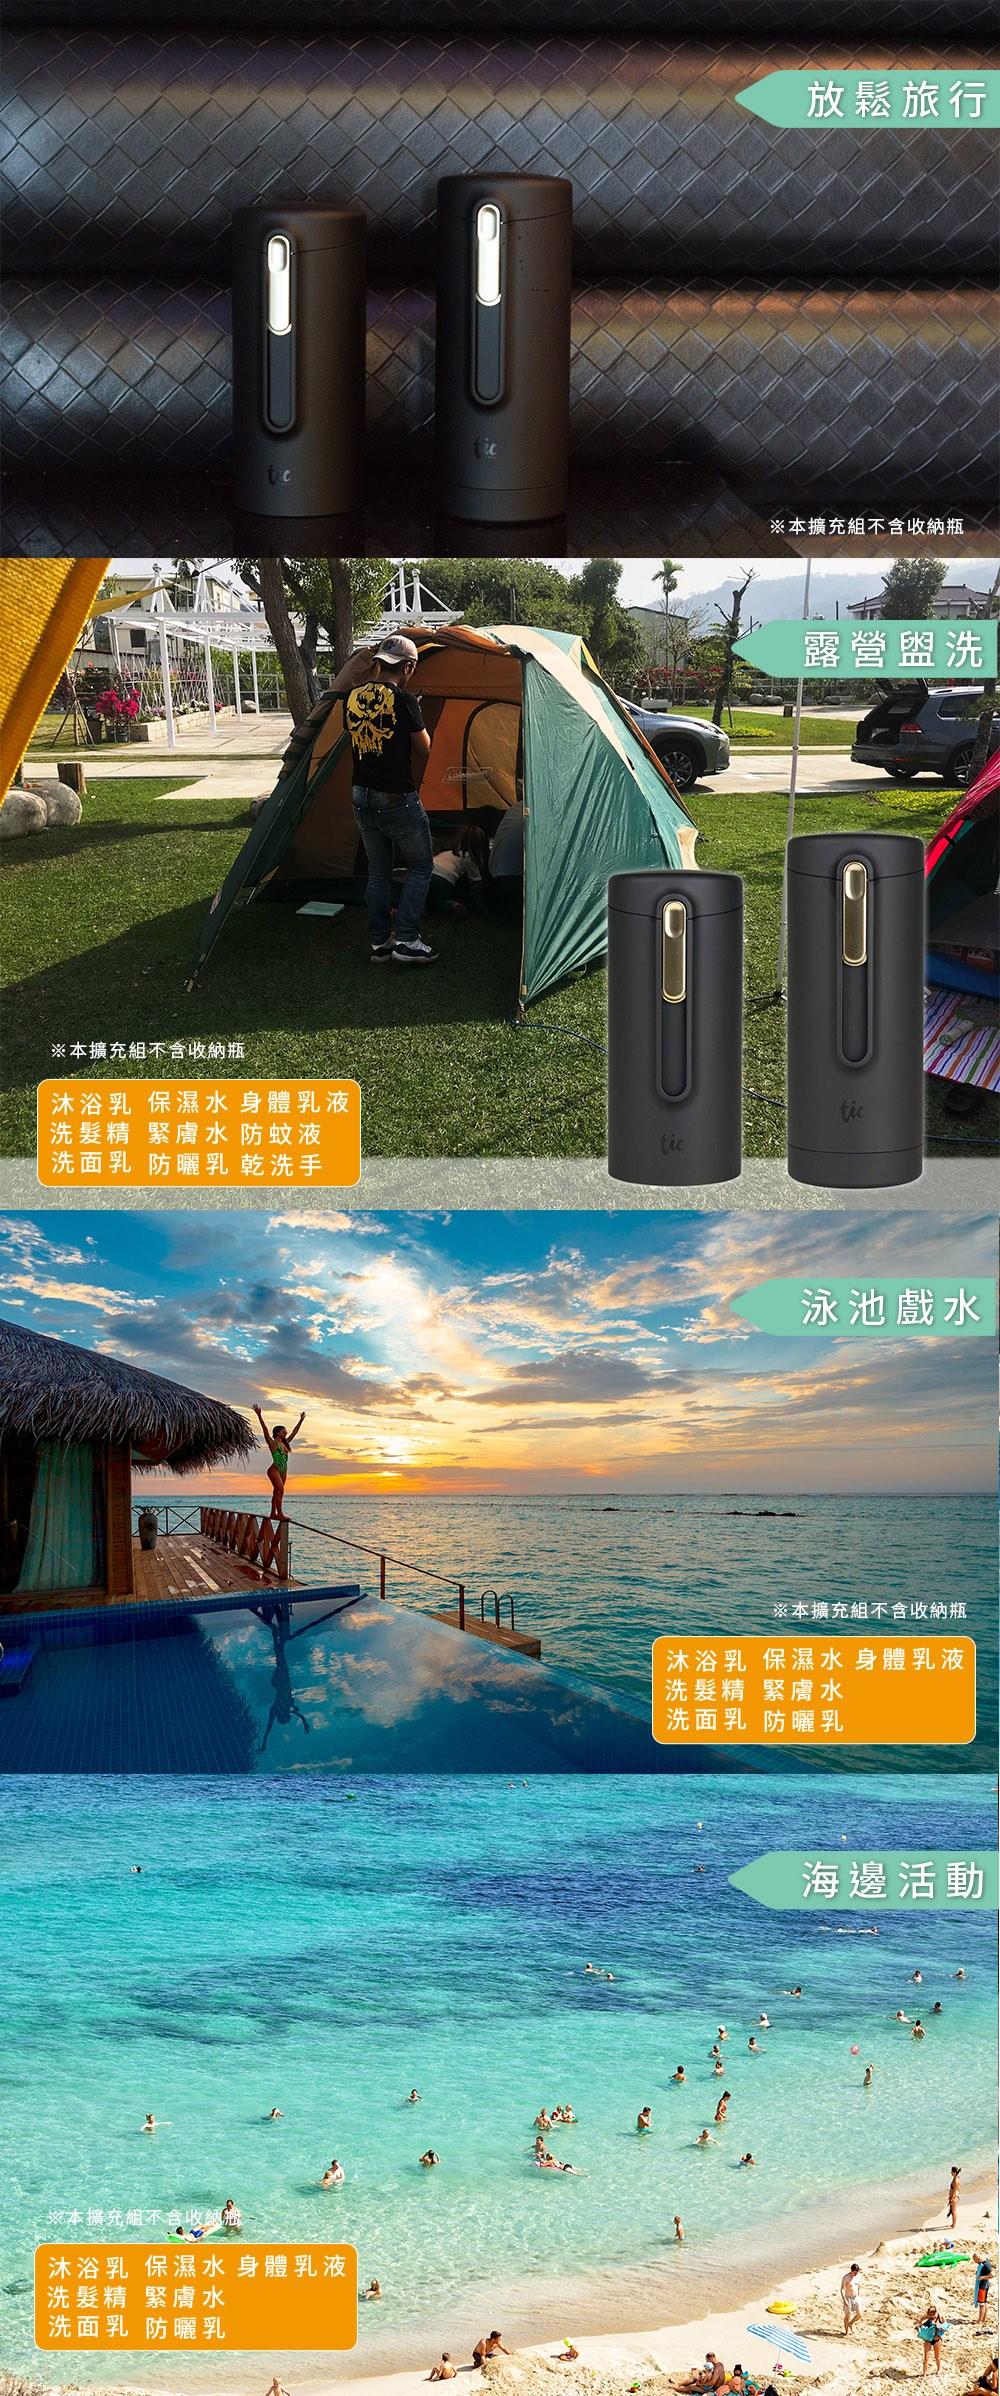 TIC BOTTLE V2.0在露營區的帳篷旁,一個在海邊的無邊際泳池,人潮眾多的海灘